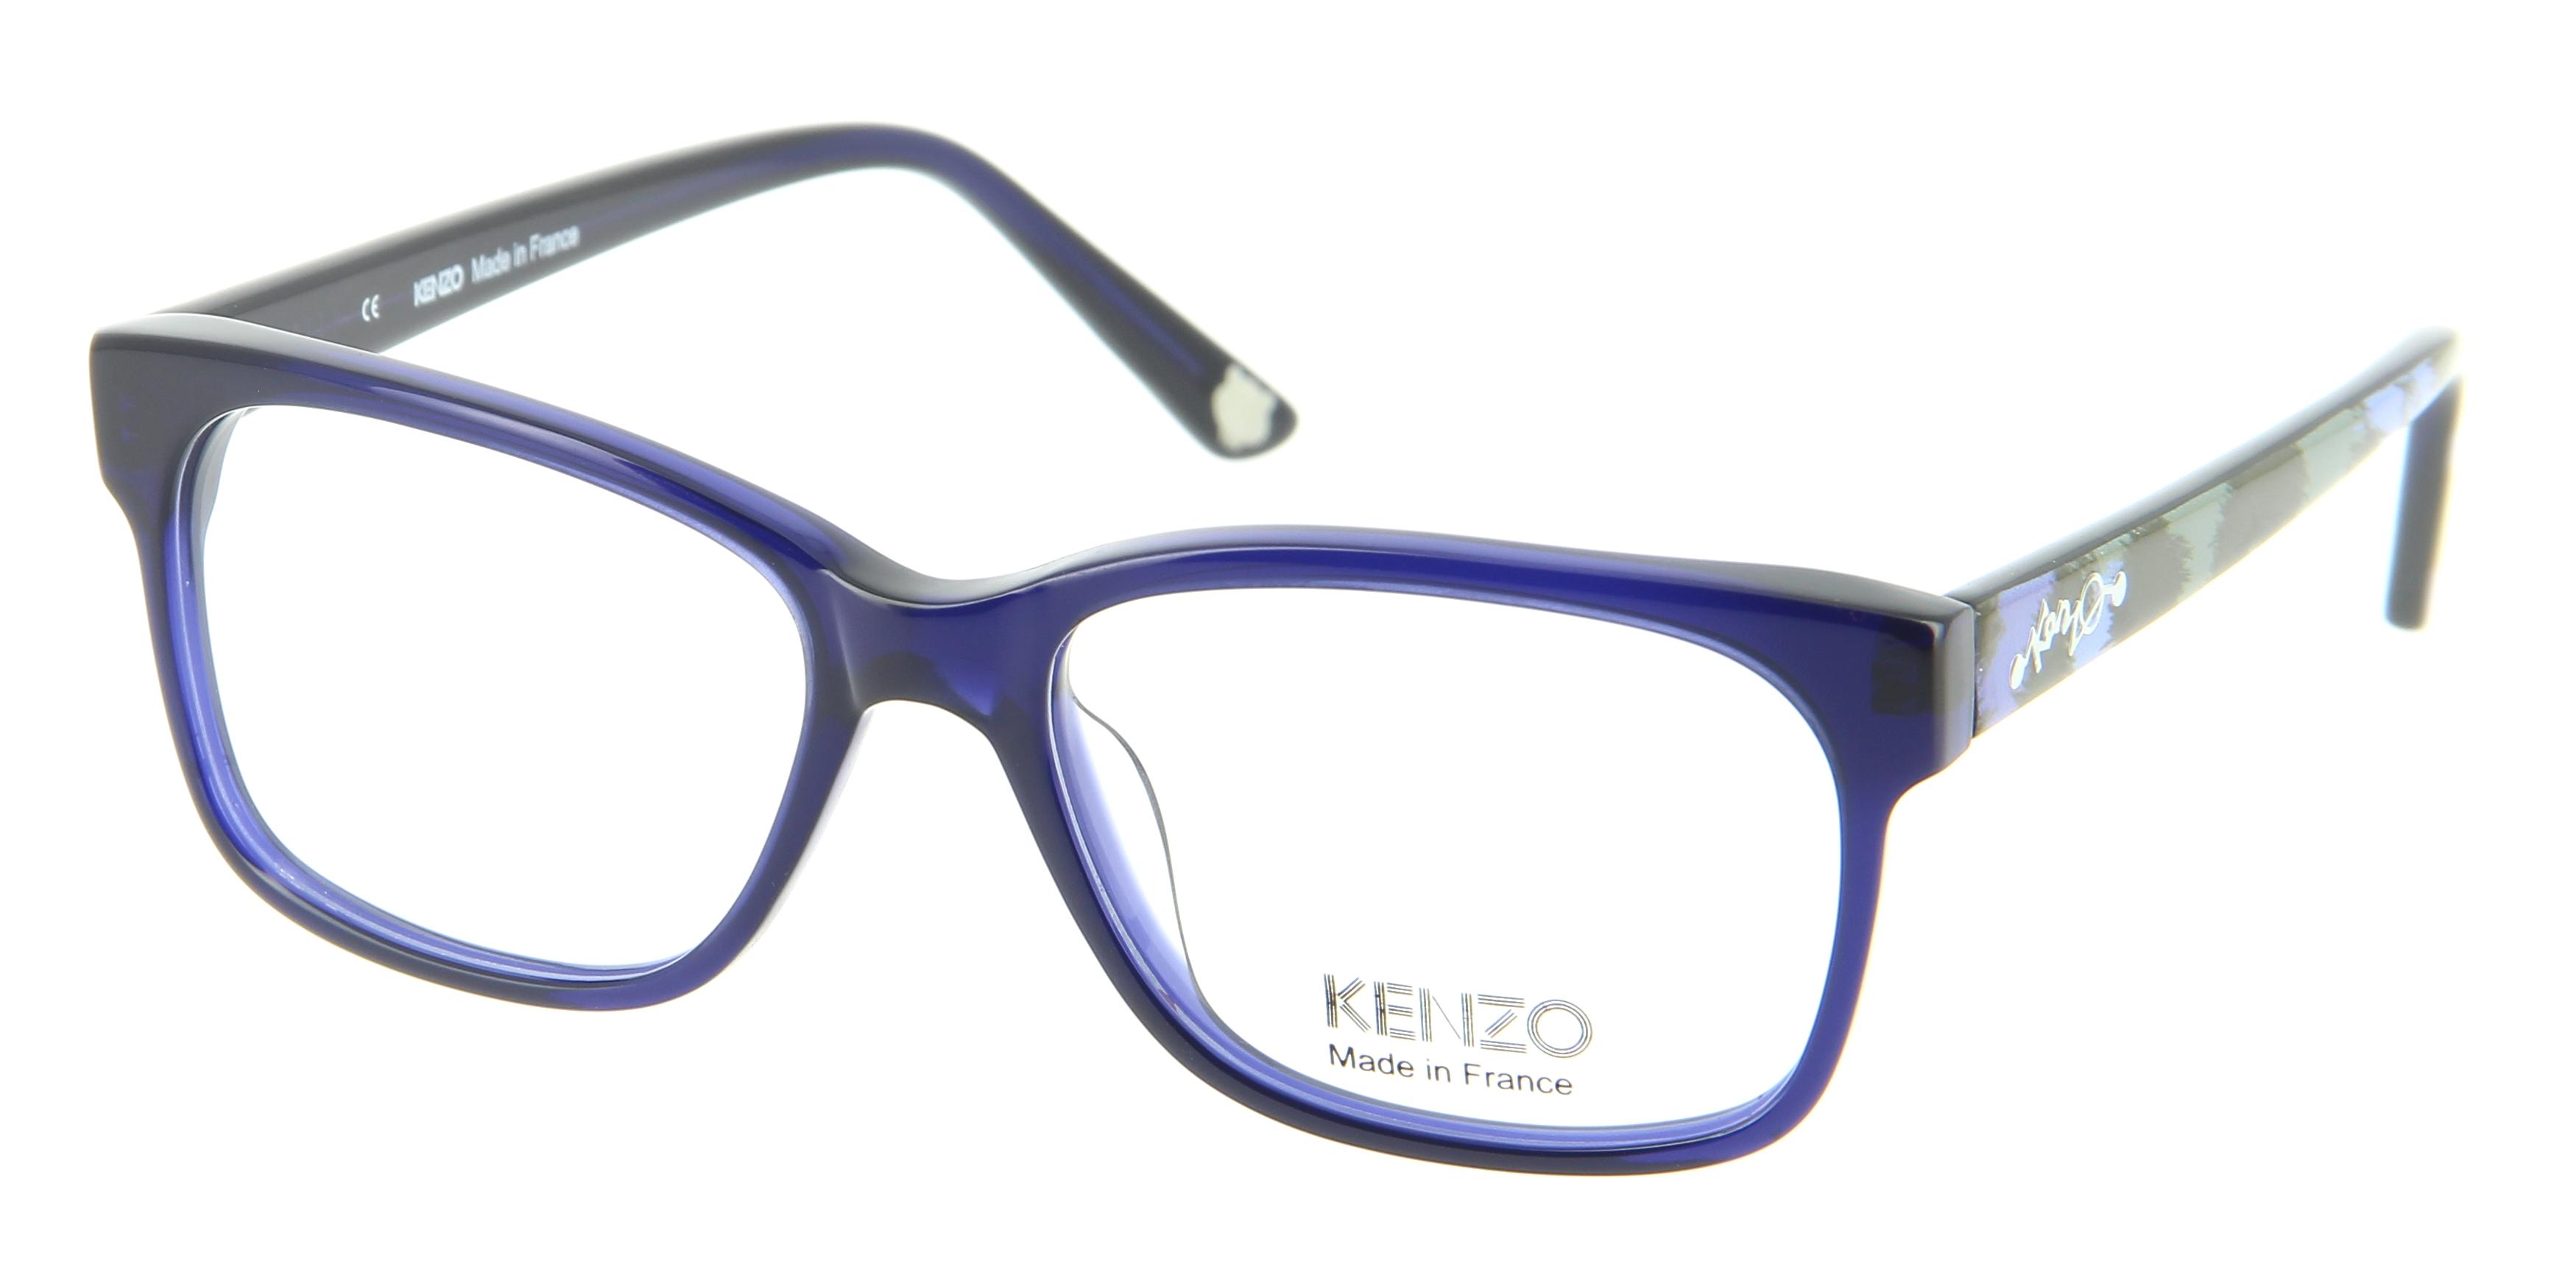 Kenzo Optical Glasses : Eyeglasses KENZO KZ 2218 C03 53/16 Woman bleu square ...